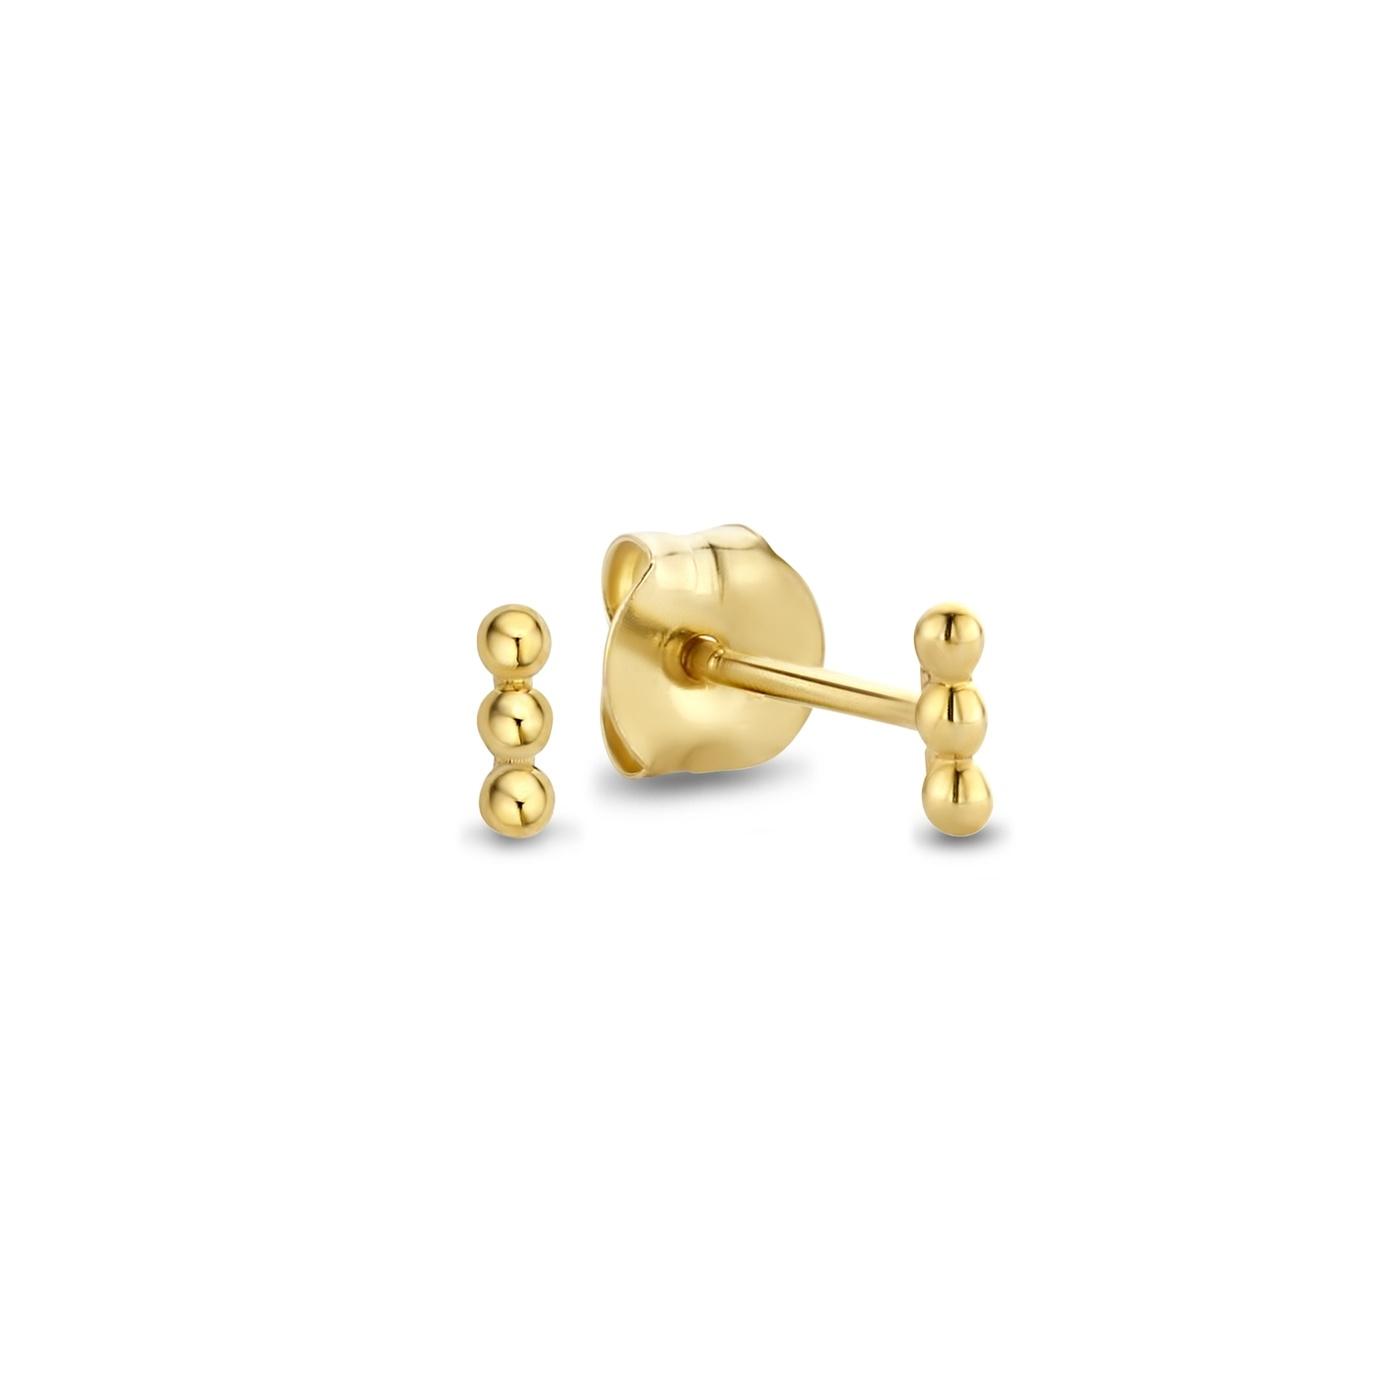 Isabel Bernard Rivoli Claire 14 karat gold ear studs with sphere